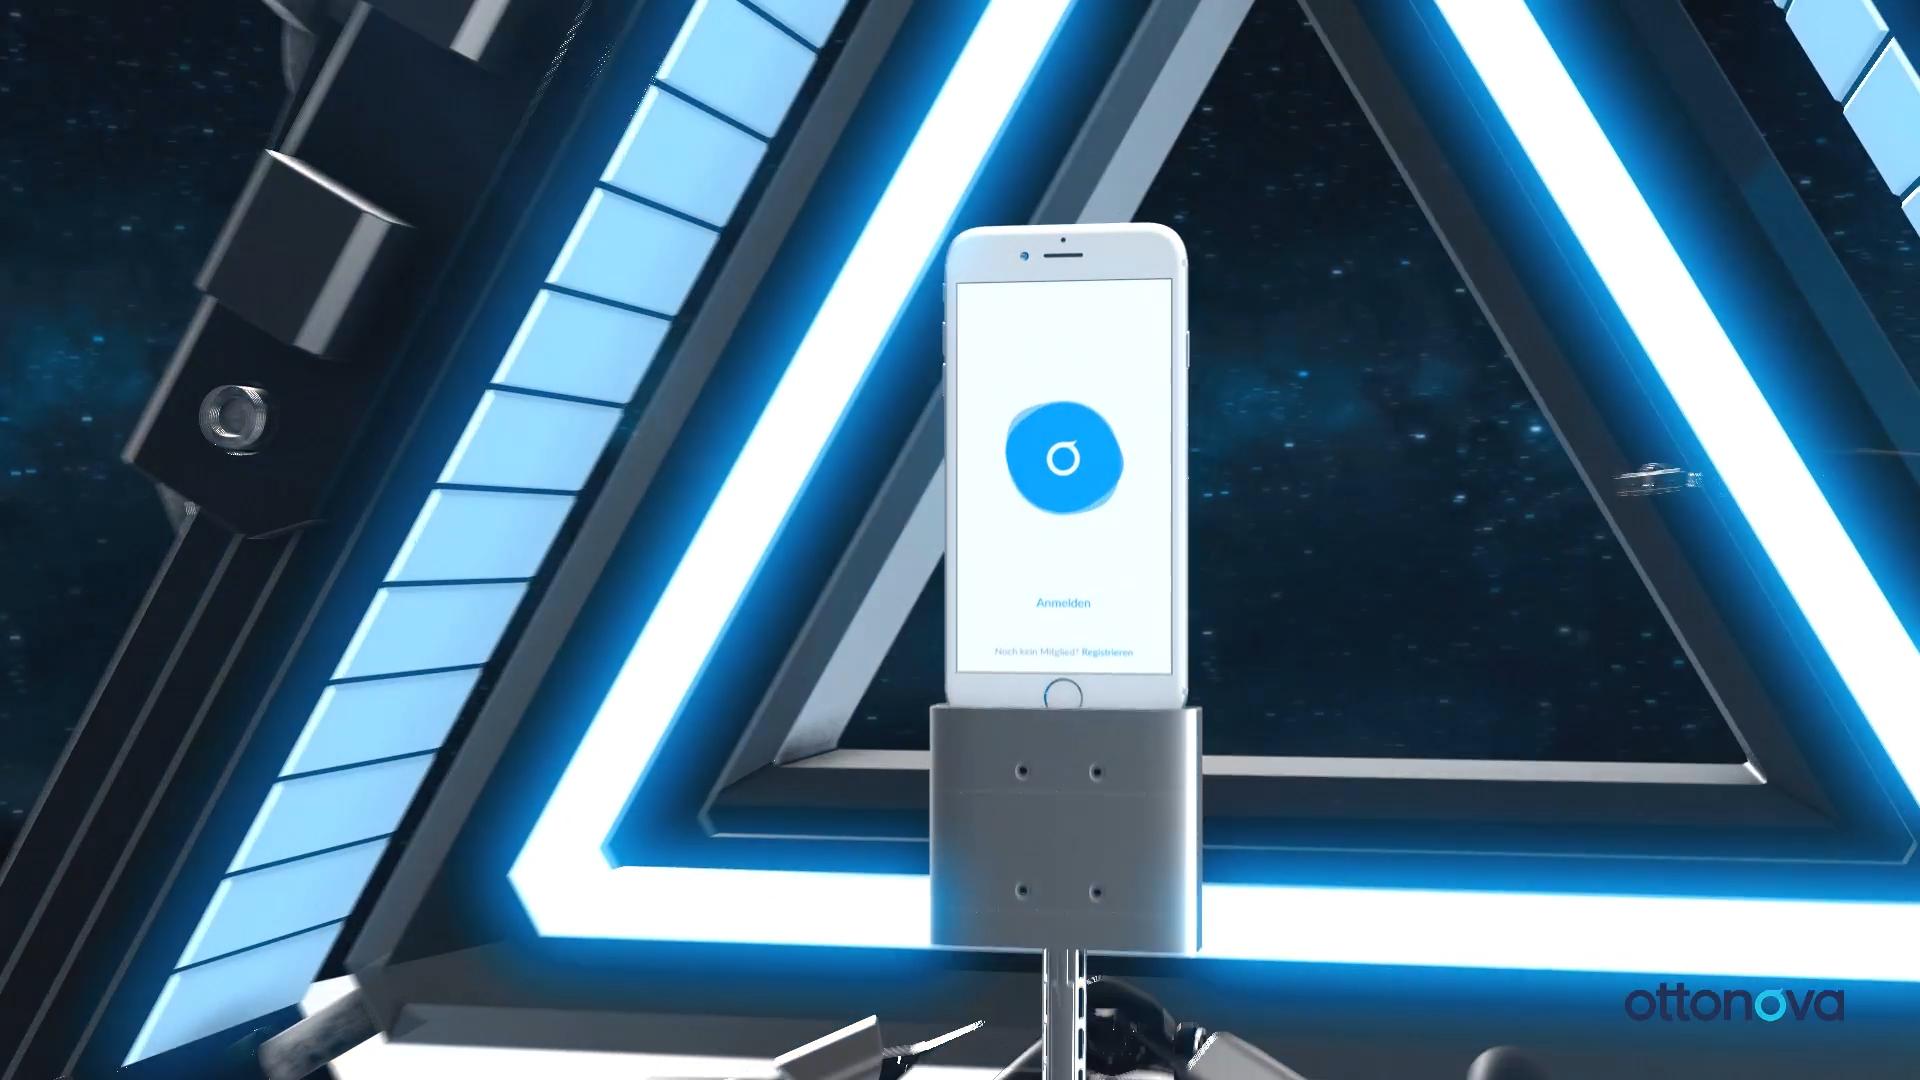 Smartphone with Ottonova digital health insurance app open.